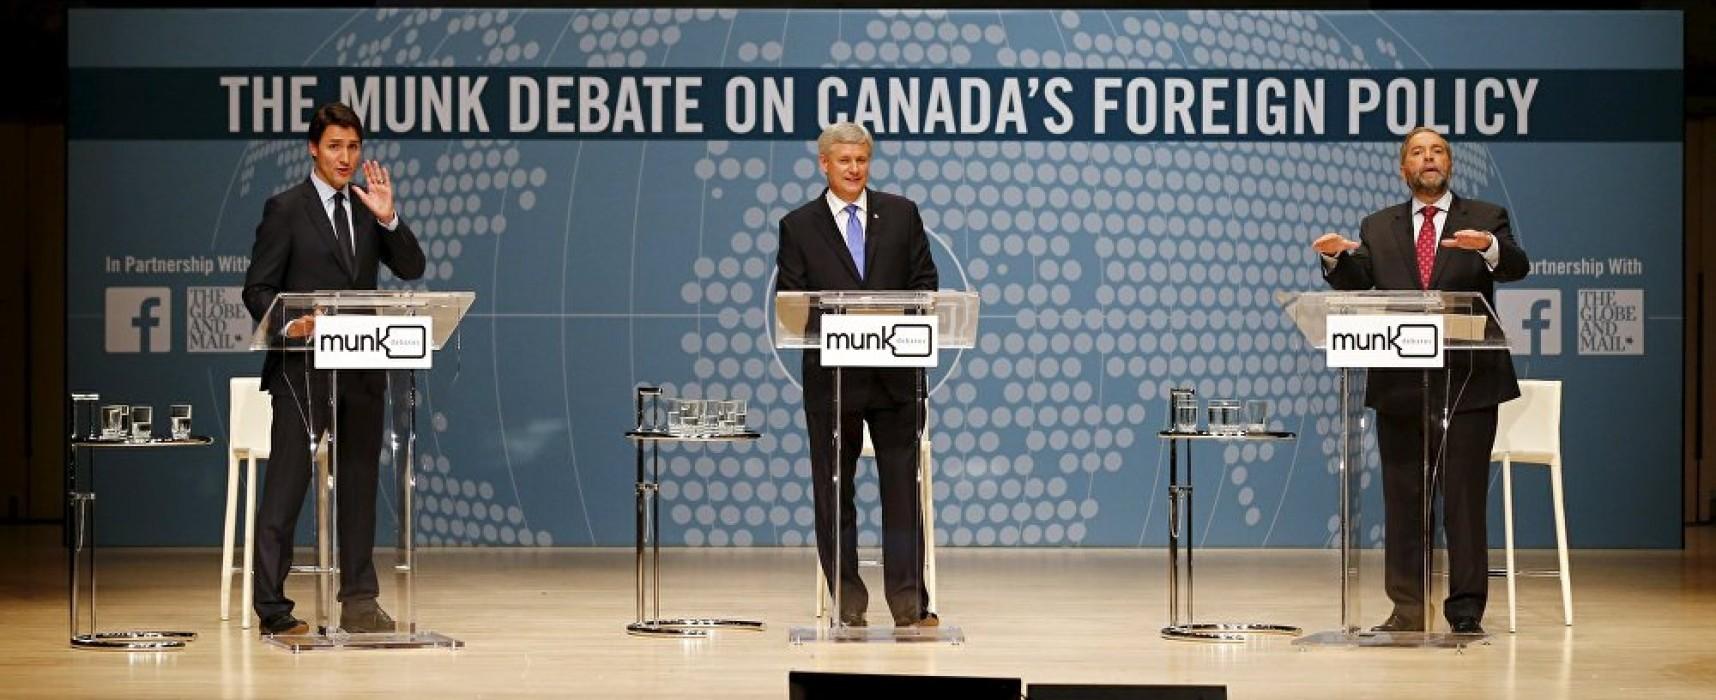 'Cold as Ice': Canada's Election, as Told Through Russian Propaganda